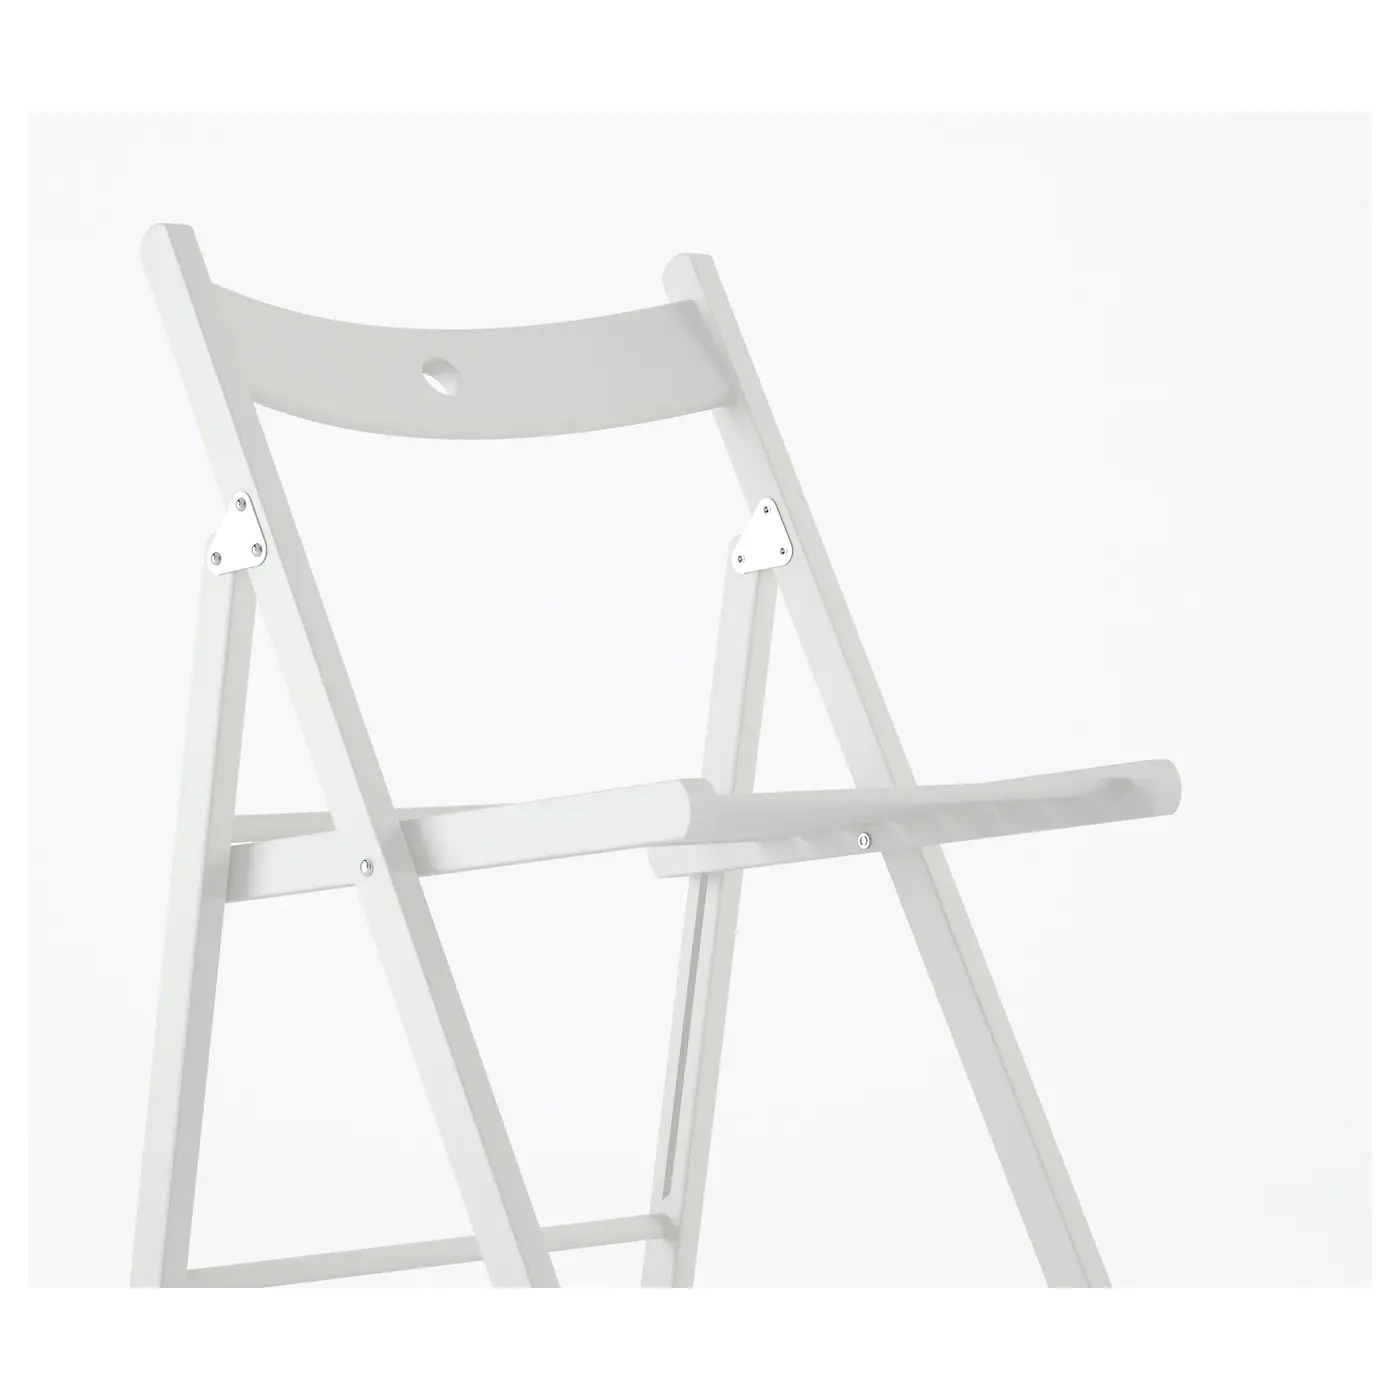 ikea foldable chairs tub chair covers australia terje folding white